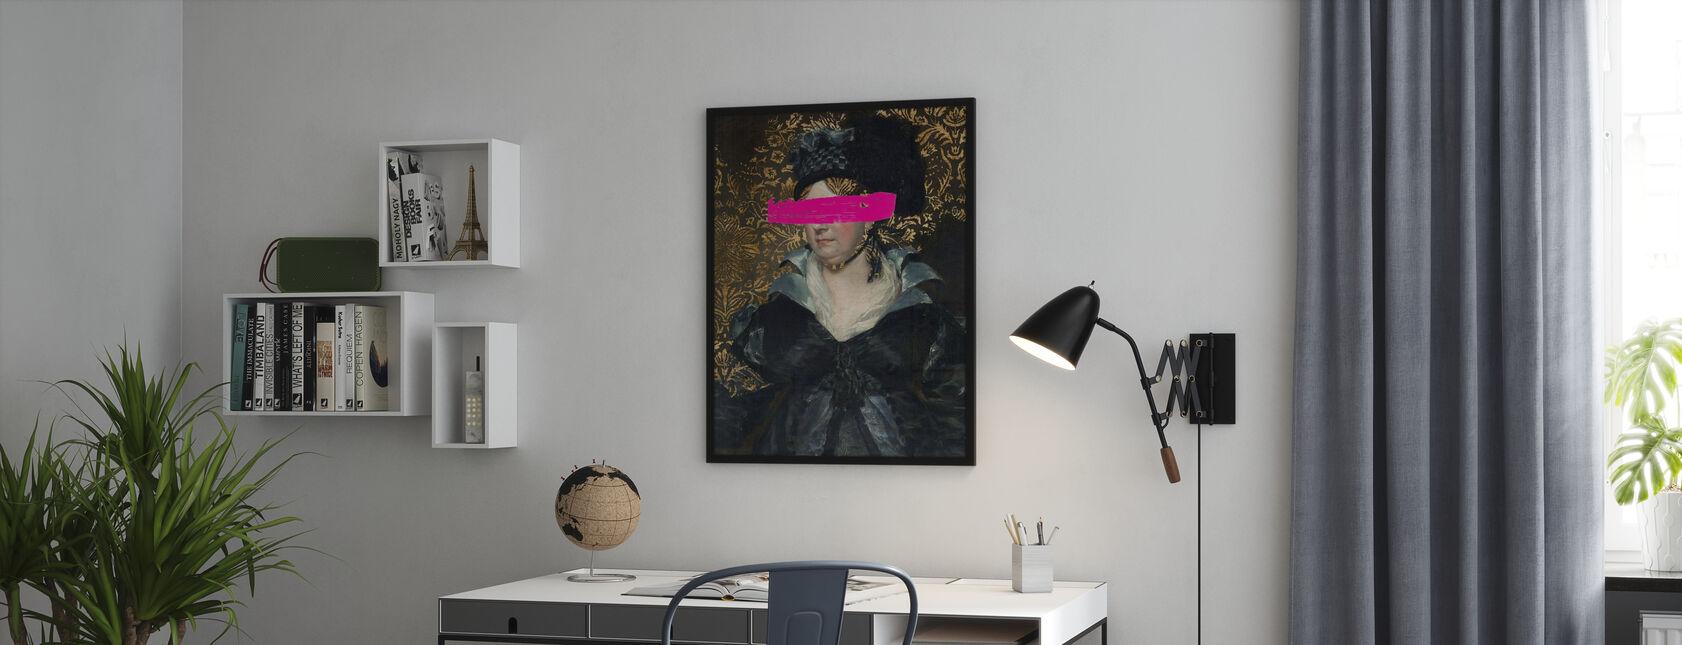 Maskert mester - Plakat - Kontor